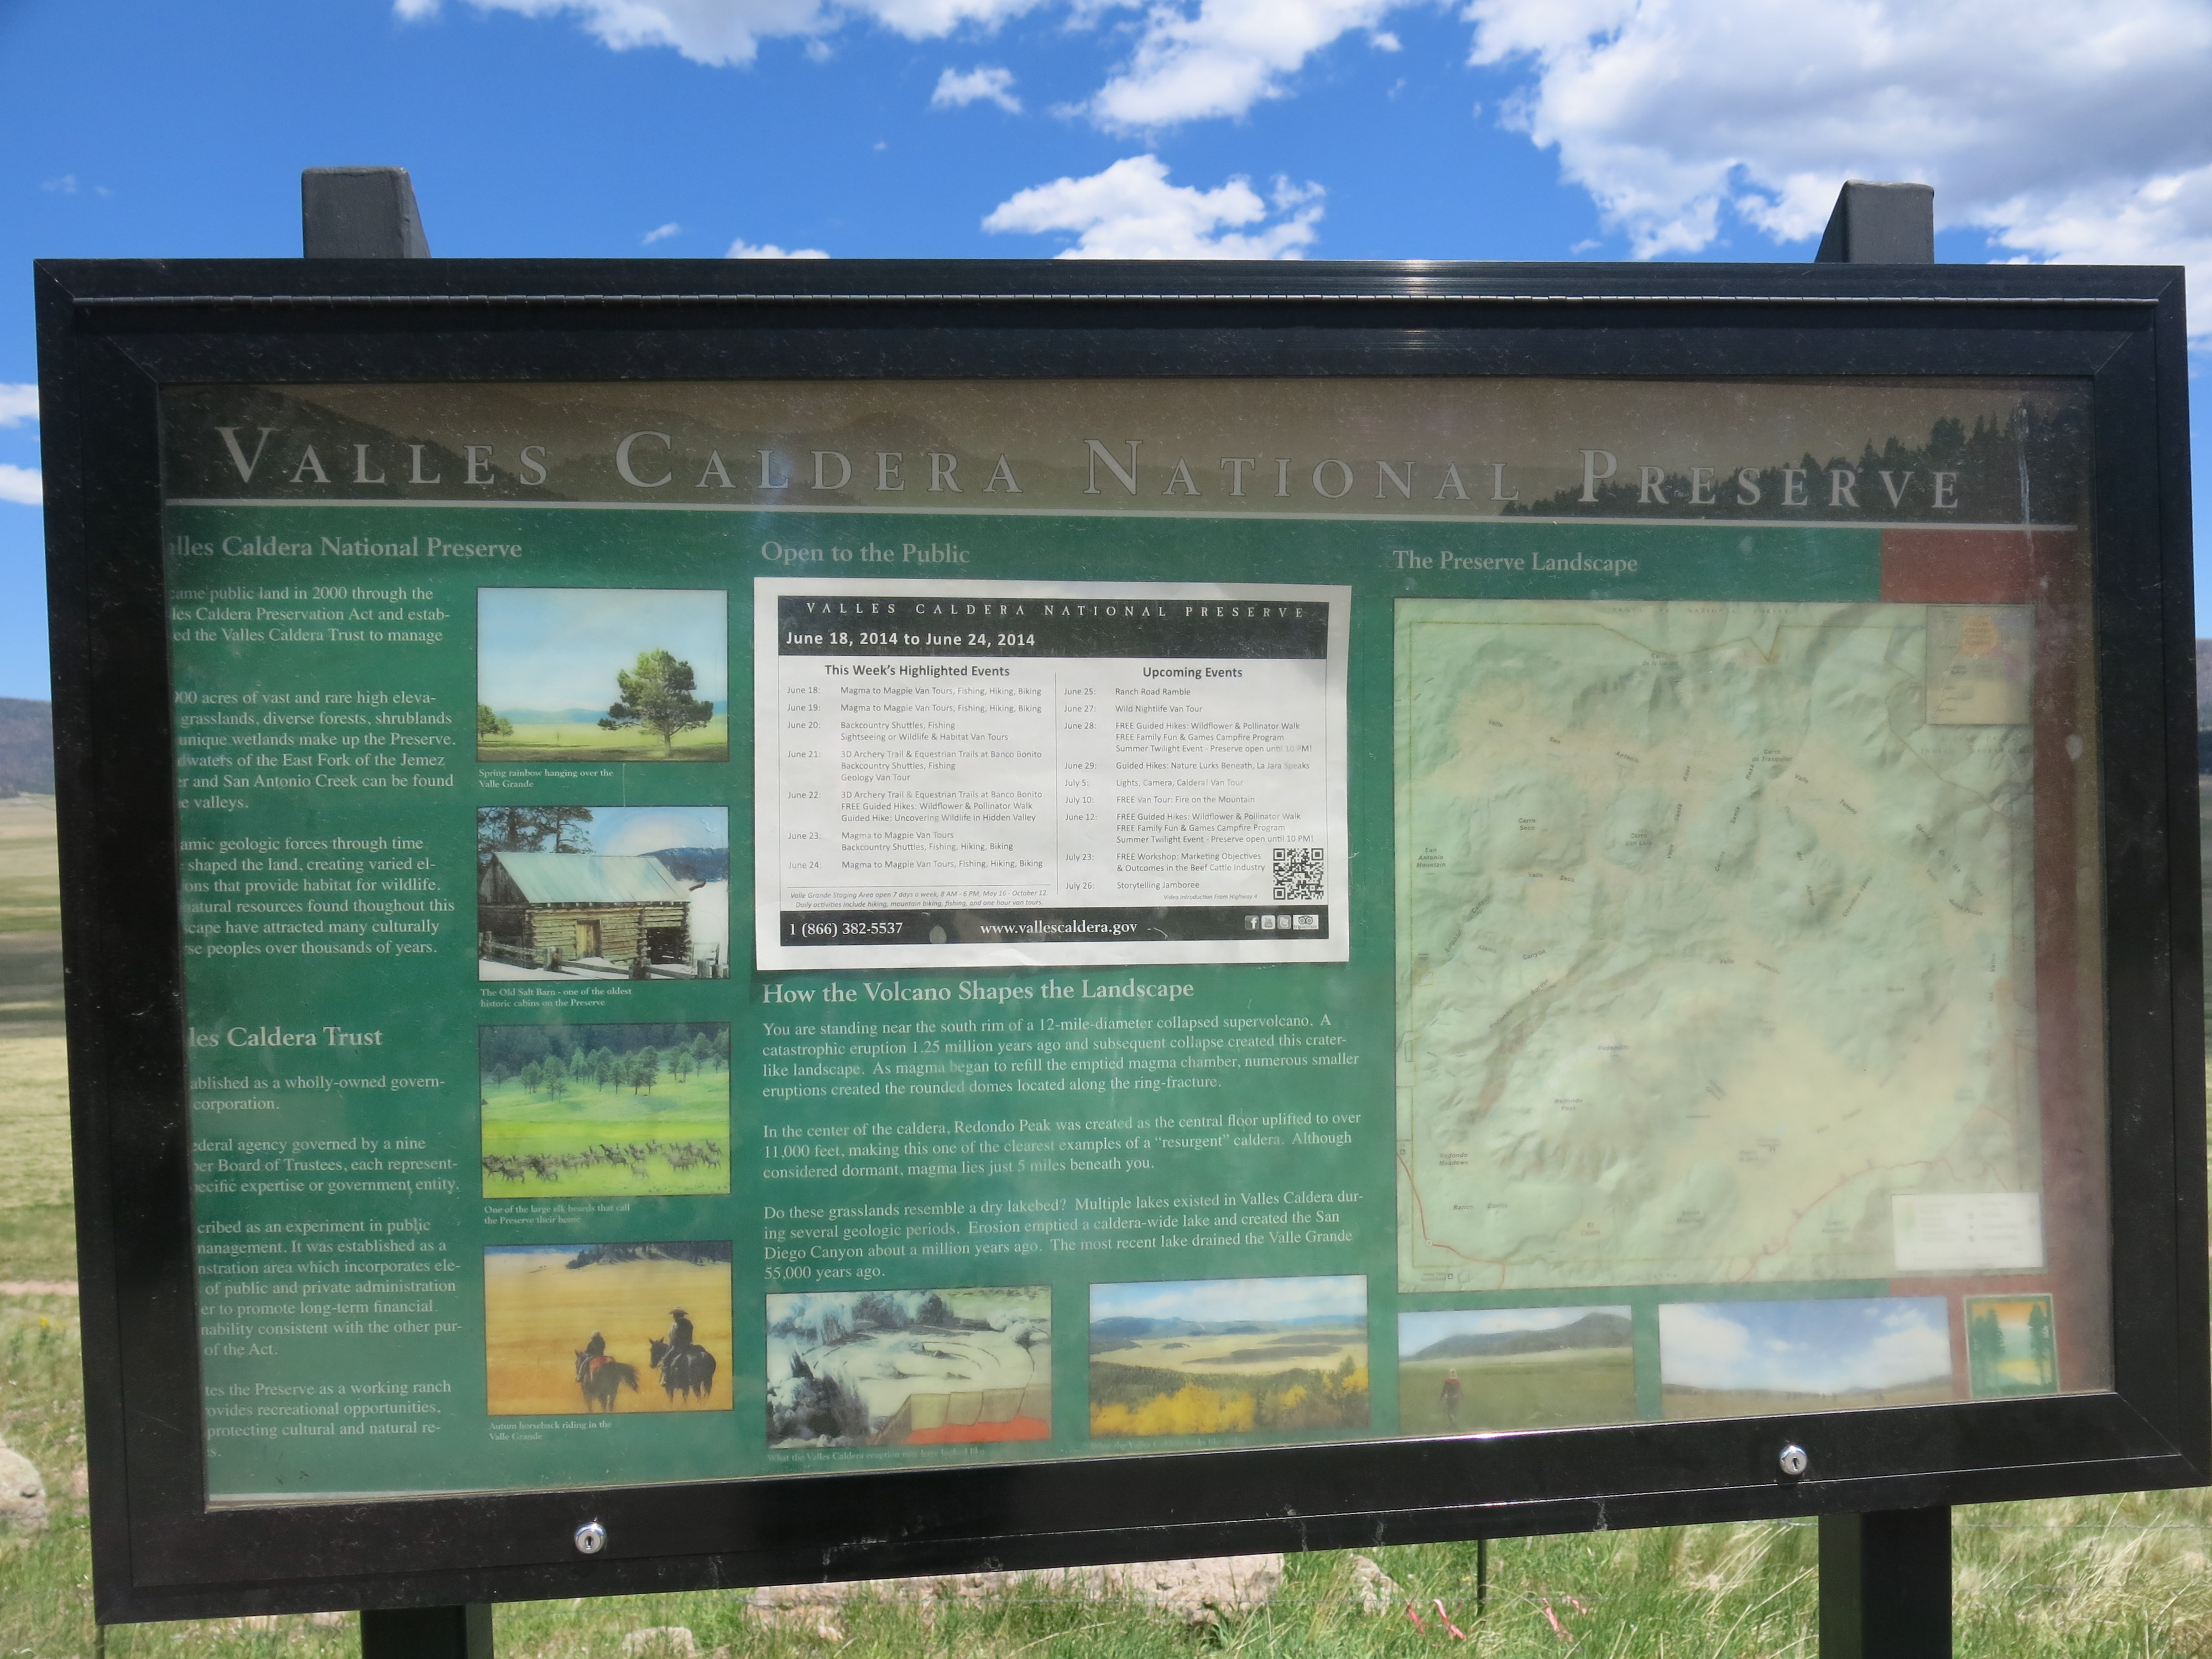 Los Alamos And The Valles Caldera National Preserve